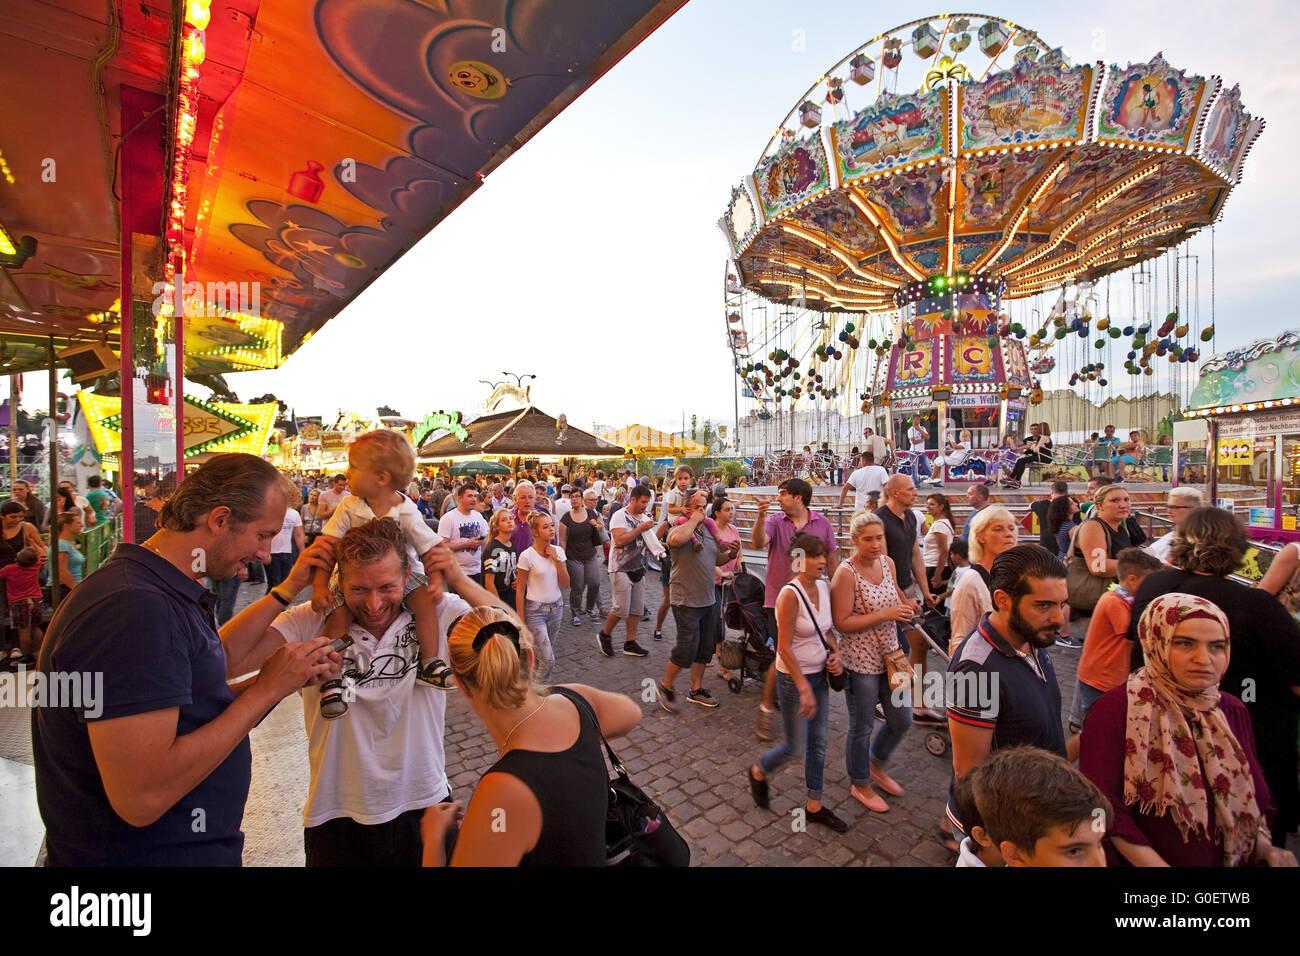 Many People at Cranger Kirmes fair, Herne, Germany - Stock Image